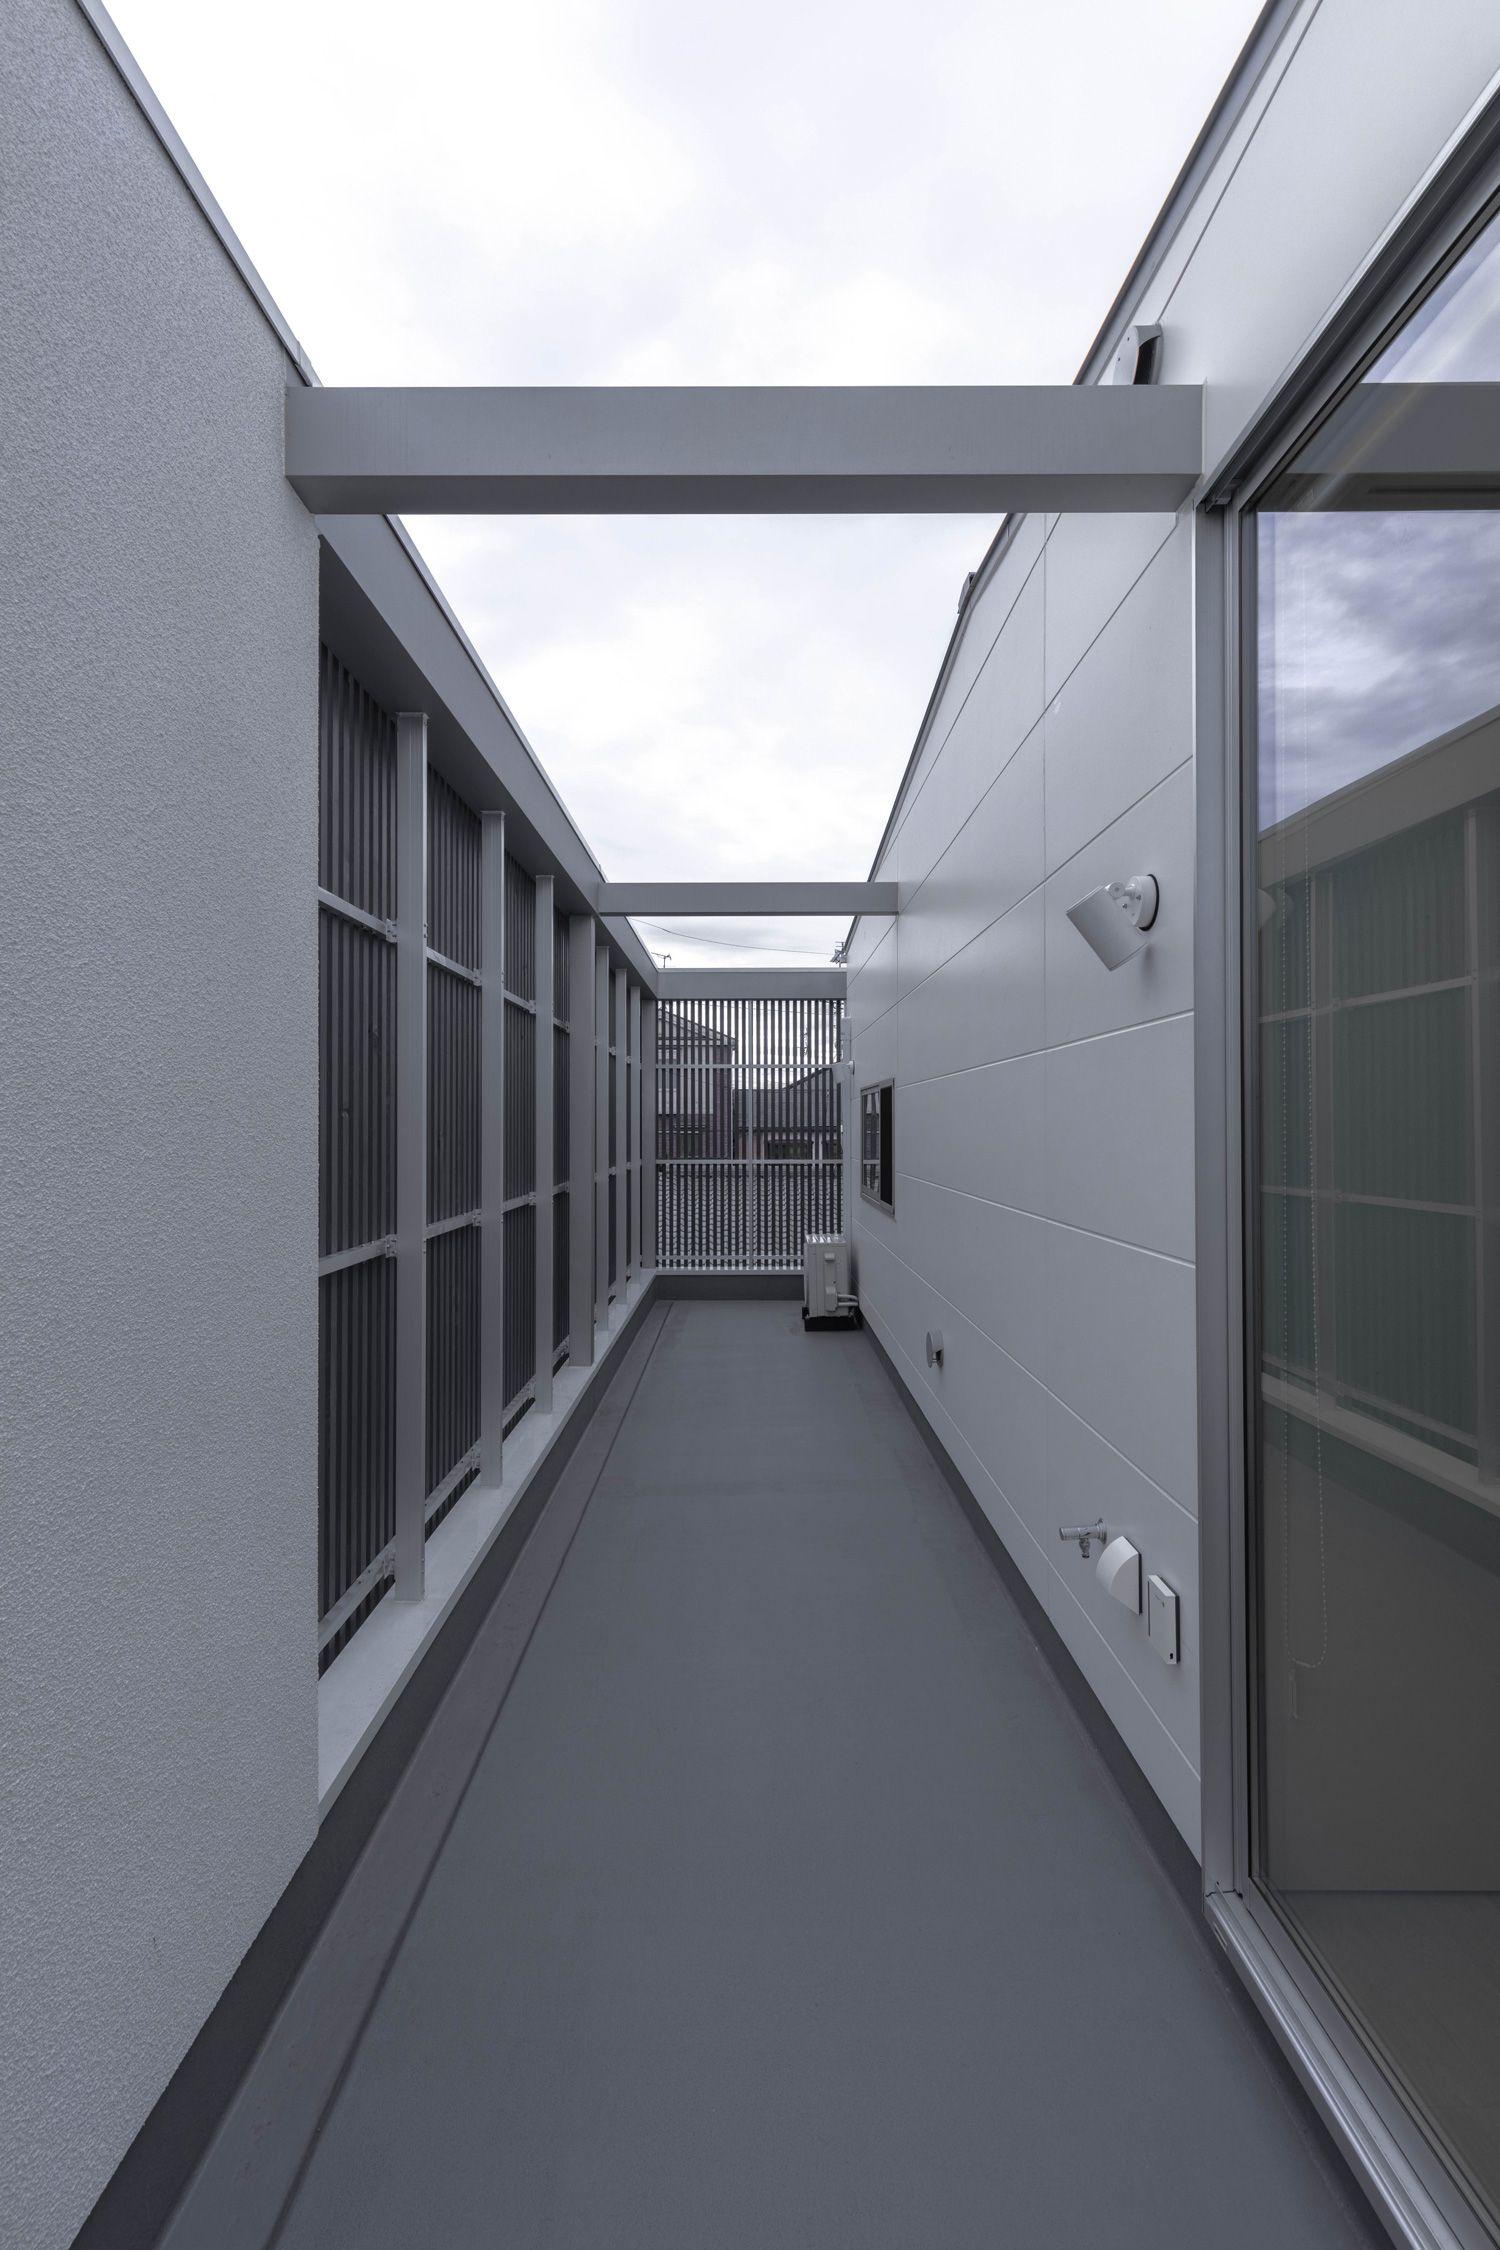 Case470 House Asian Horizontal フリーダムアーキテクツデザイン 建築設計事務所 建築